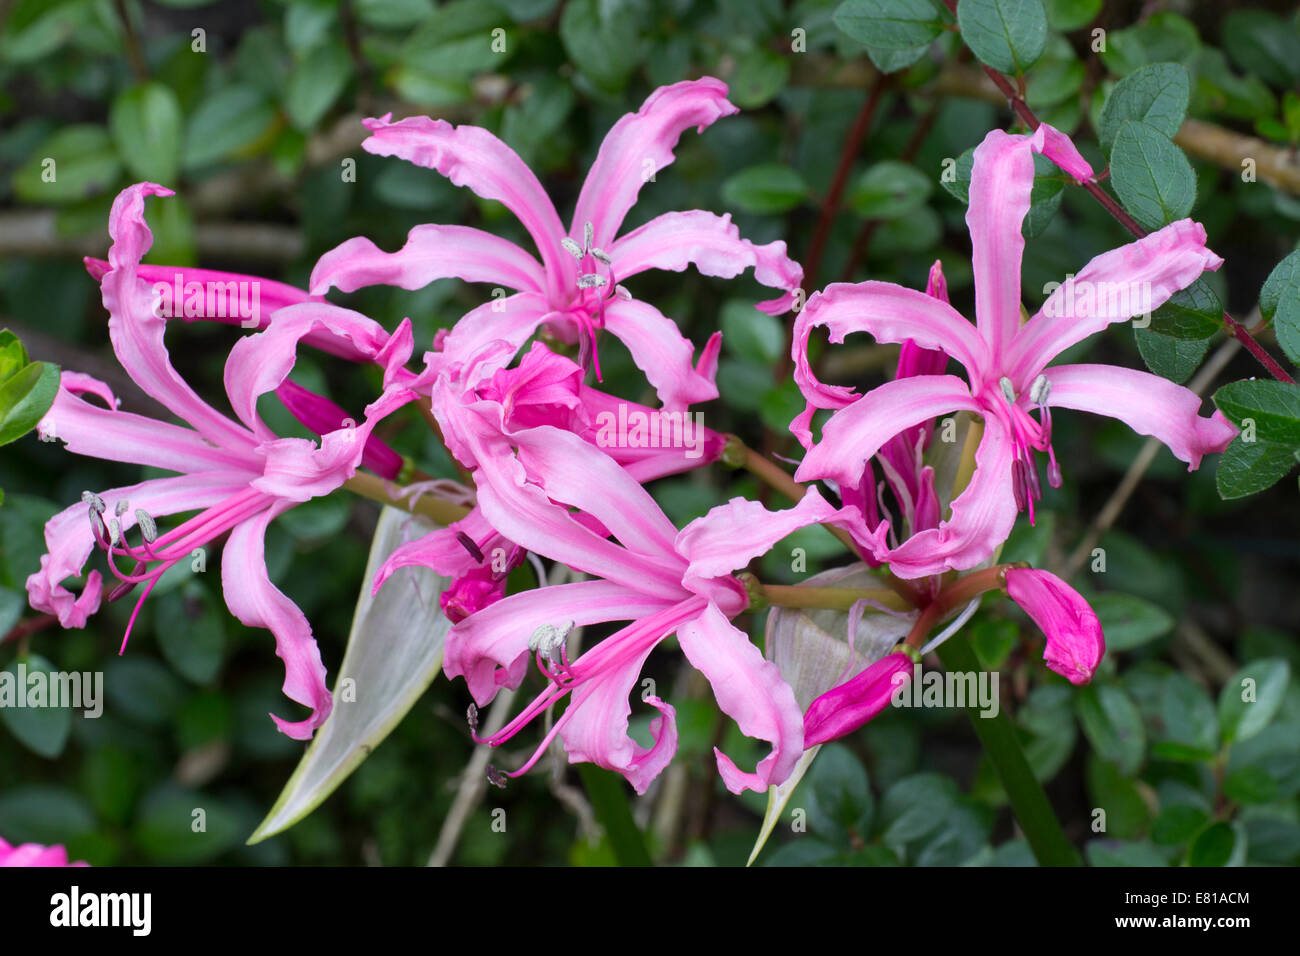 Autumn Flowers Of The Half Hardy South African Bulb Nerine Flexuosa